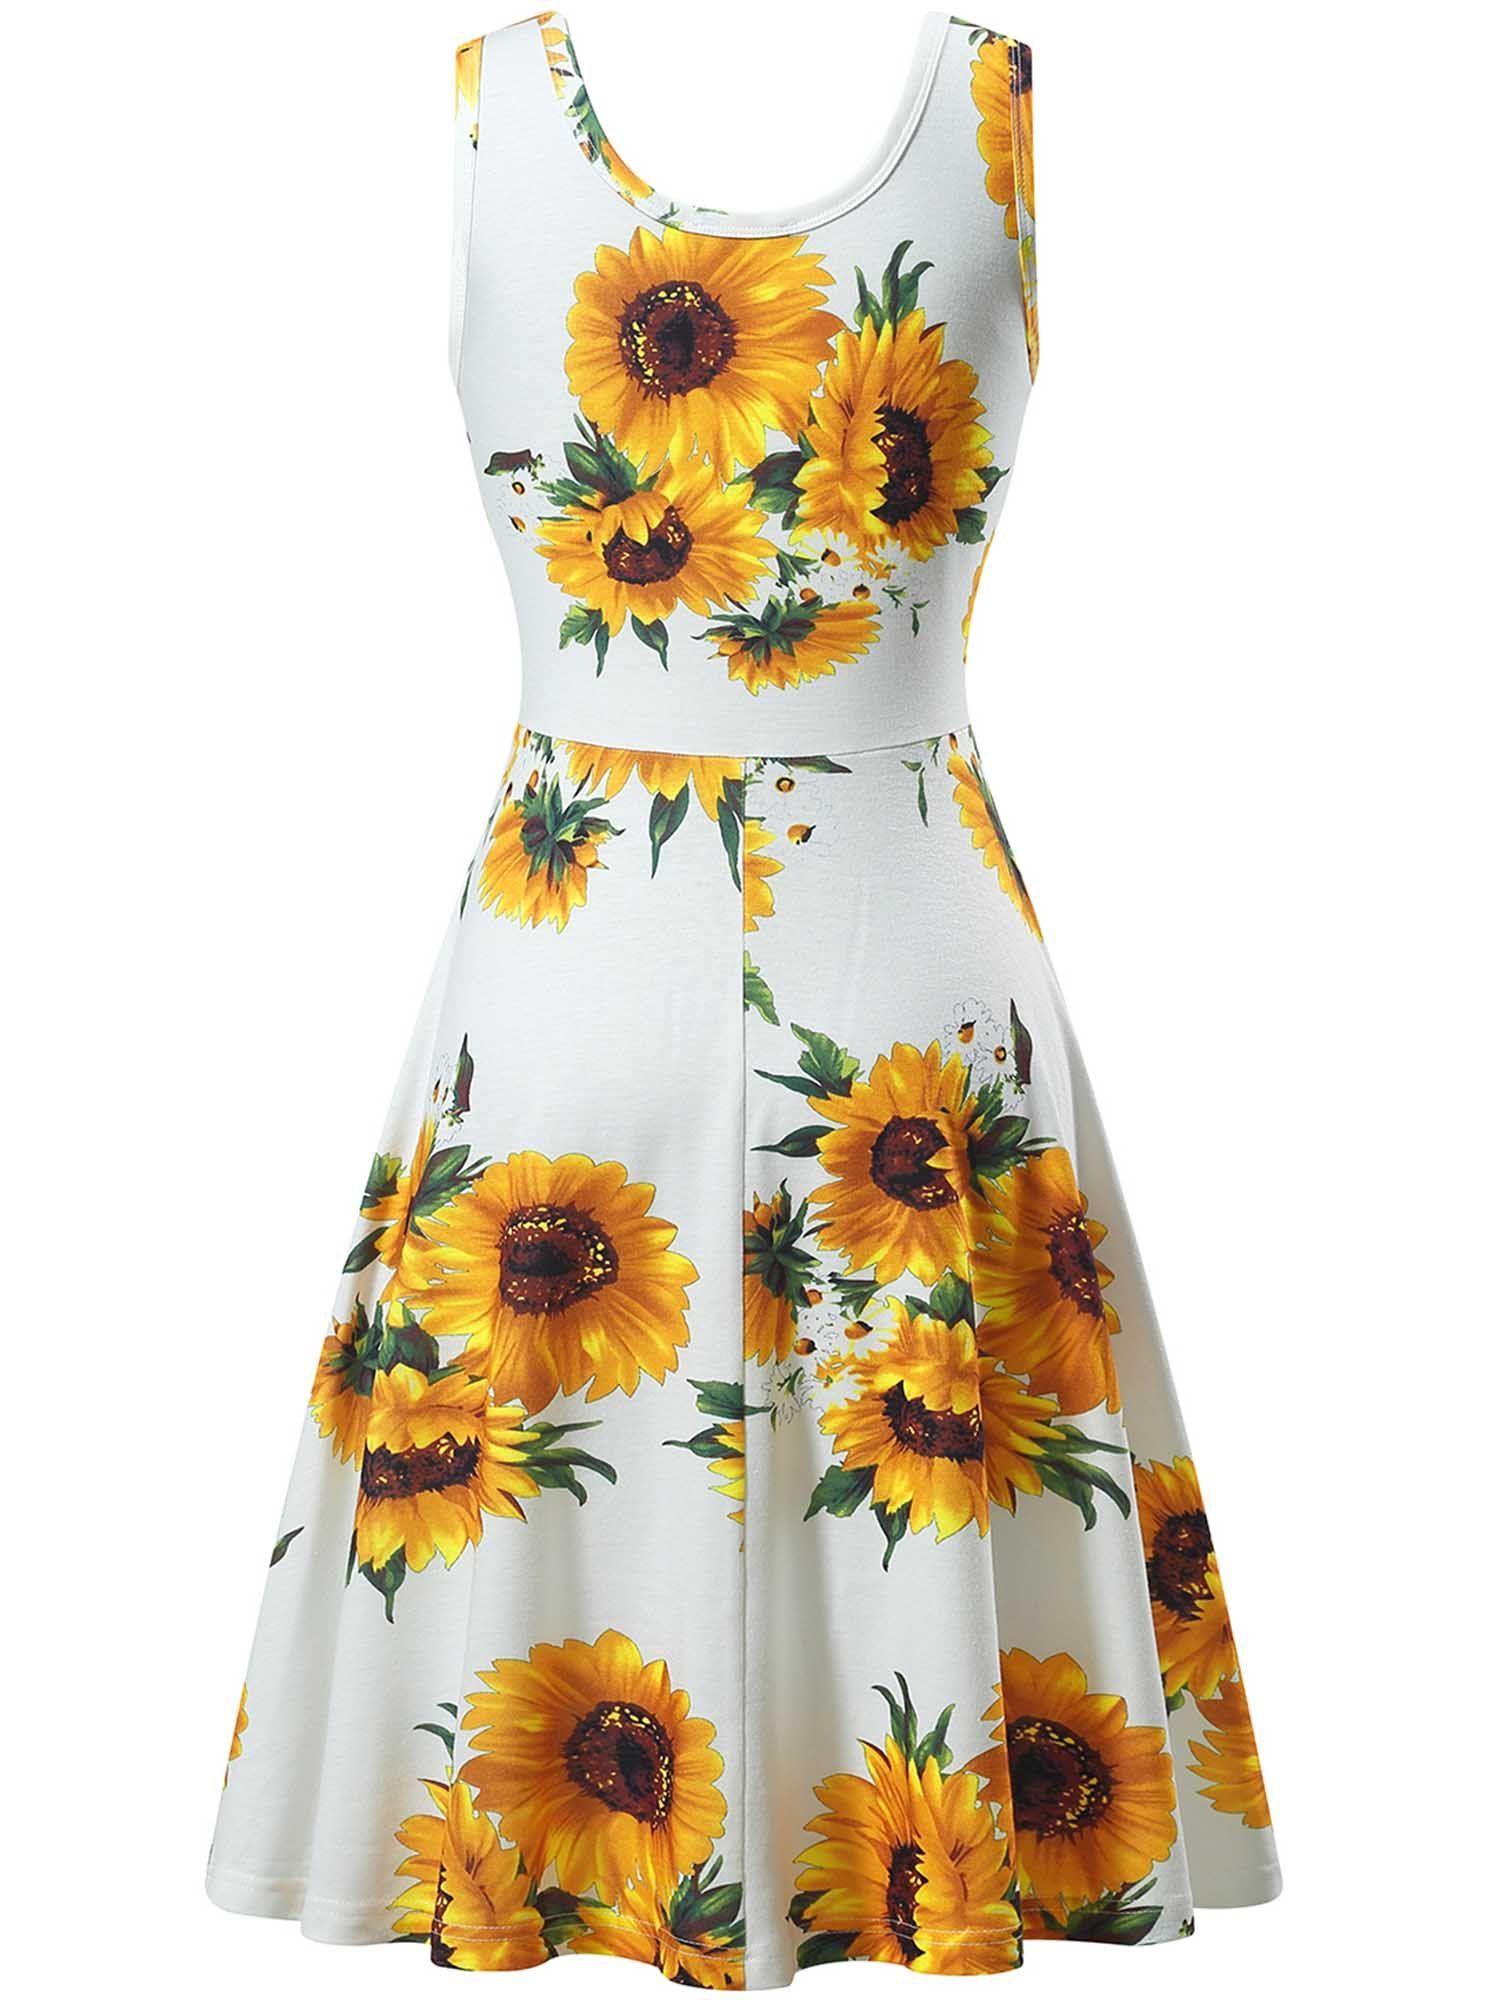 Fensace Women S Tank Top Midi Green Floral Sunflower Dresses 18034 9 Large Affiliate Summer Wedding Summer Dresses Floral Dress Summer Dresses [ 2000 x 1500 Pixel ]